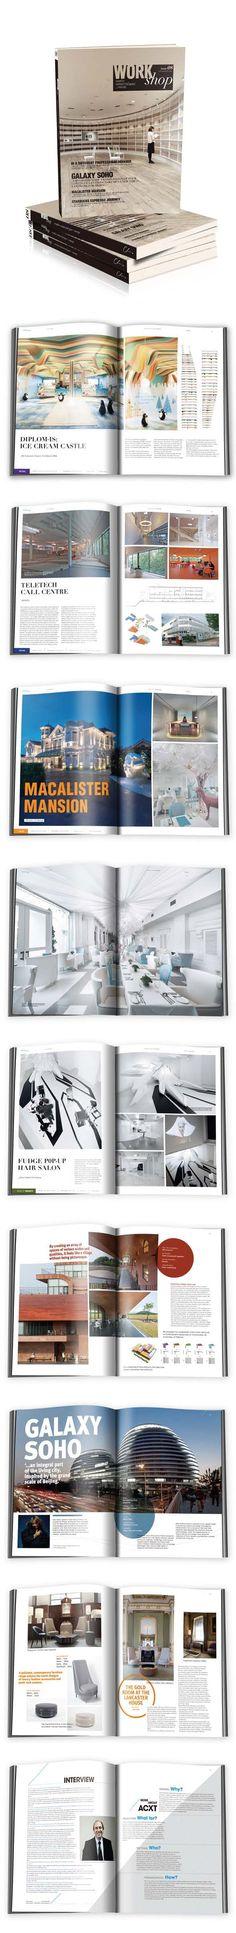 portfolio layout option / workshop by Chois Publishing , via Behance Book Design Layout, Print Layout, Design Layouts, Design Ideas, Editorial Layout, Editorial Design, Print Design, Web Design, Graphic Design